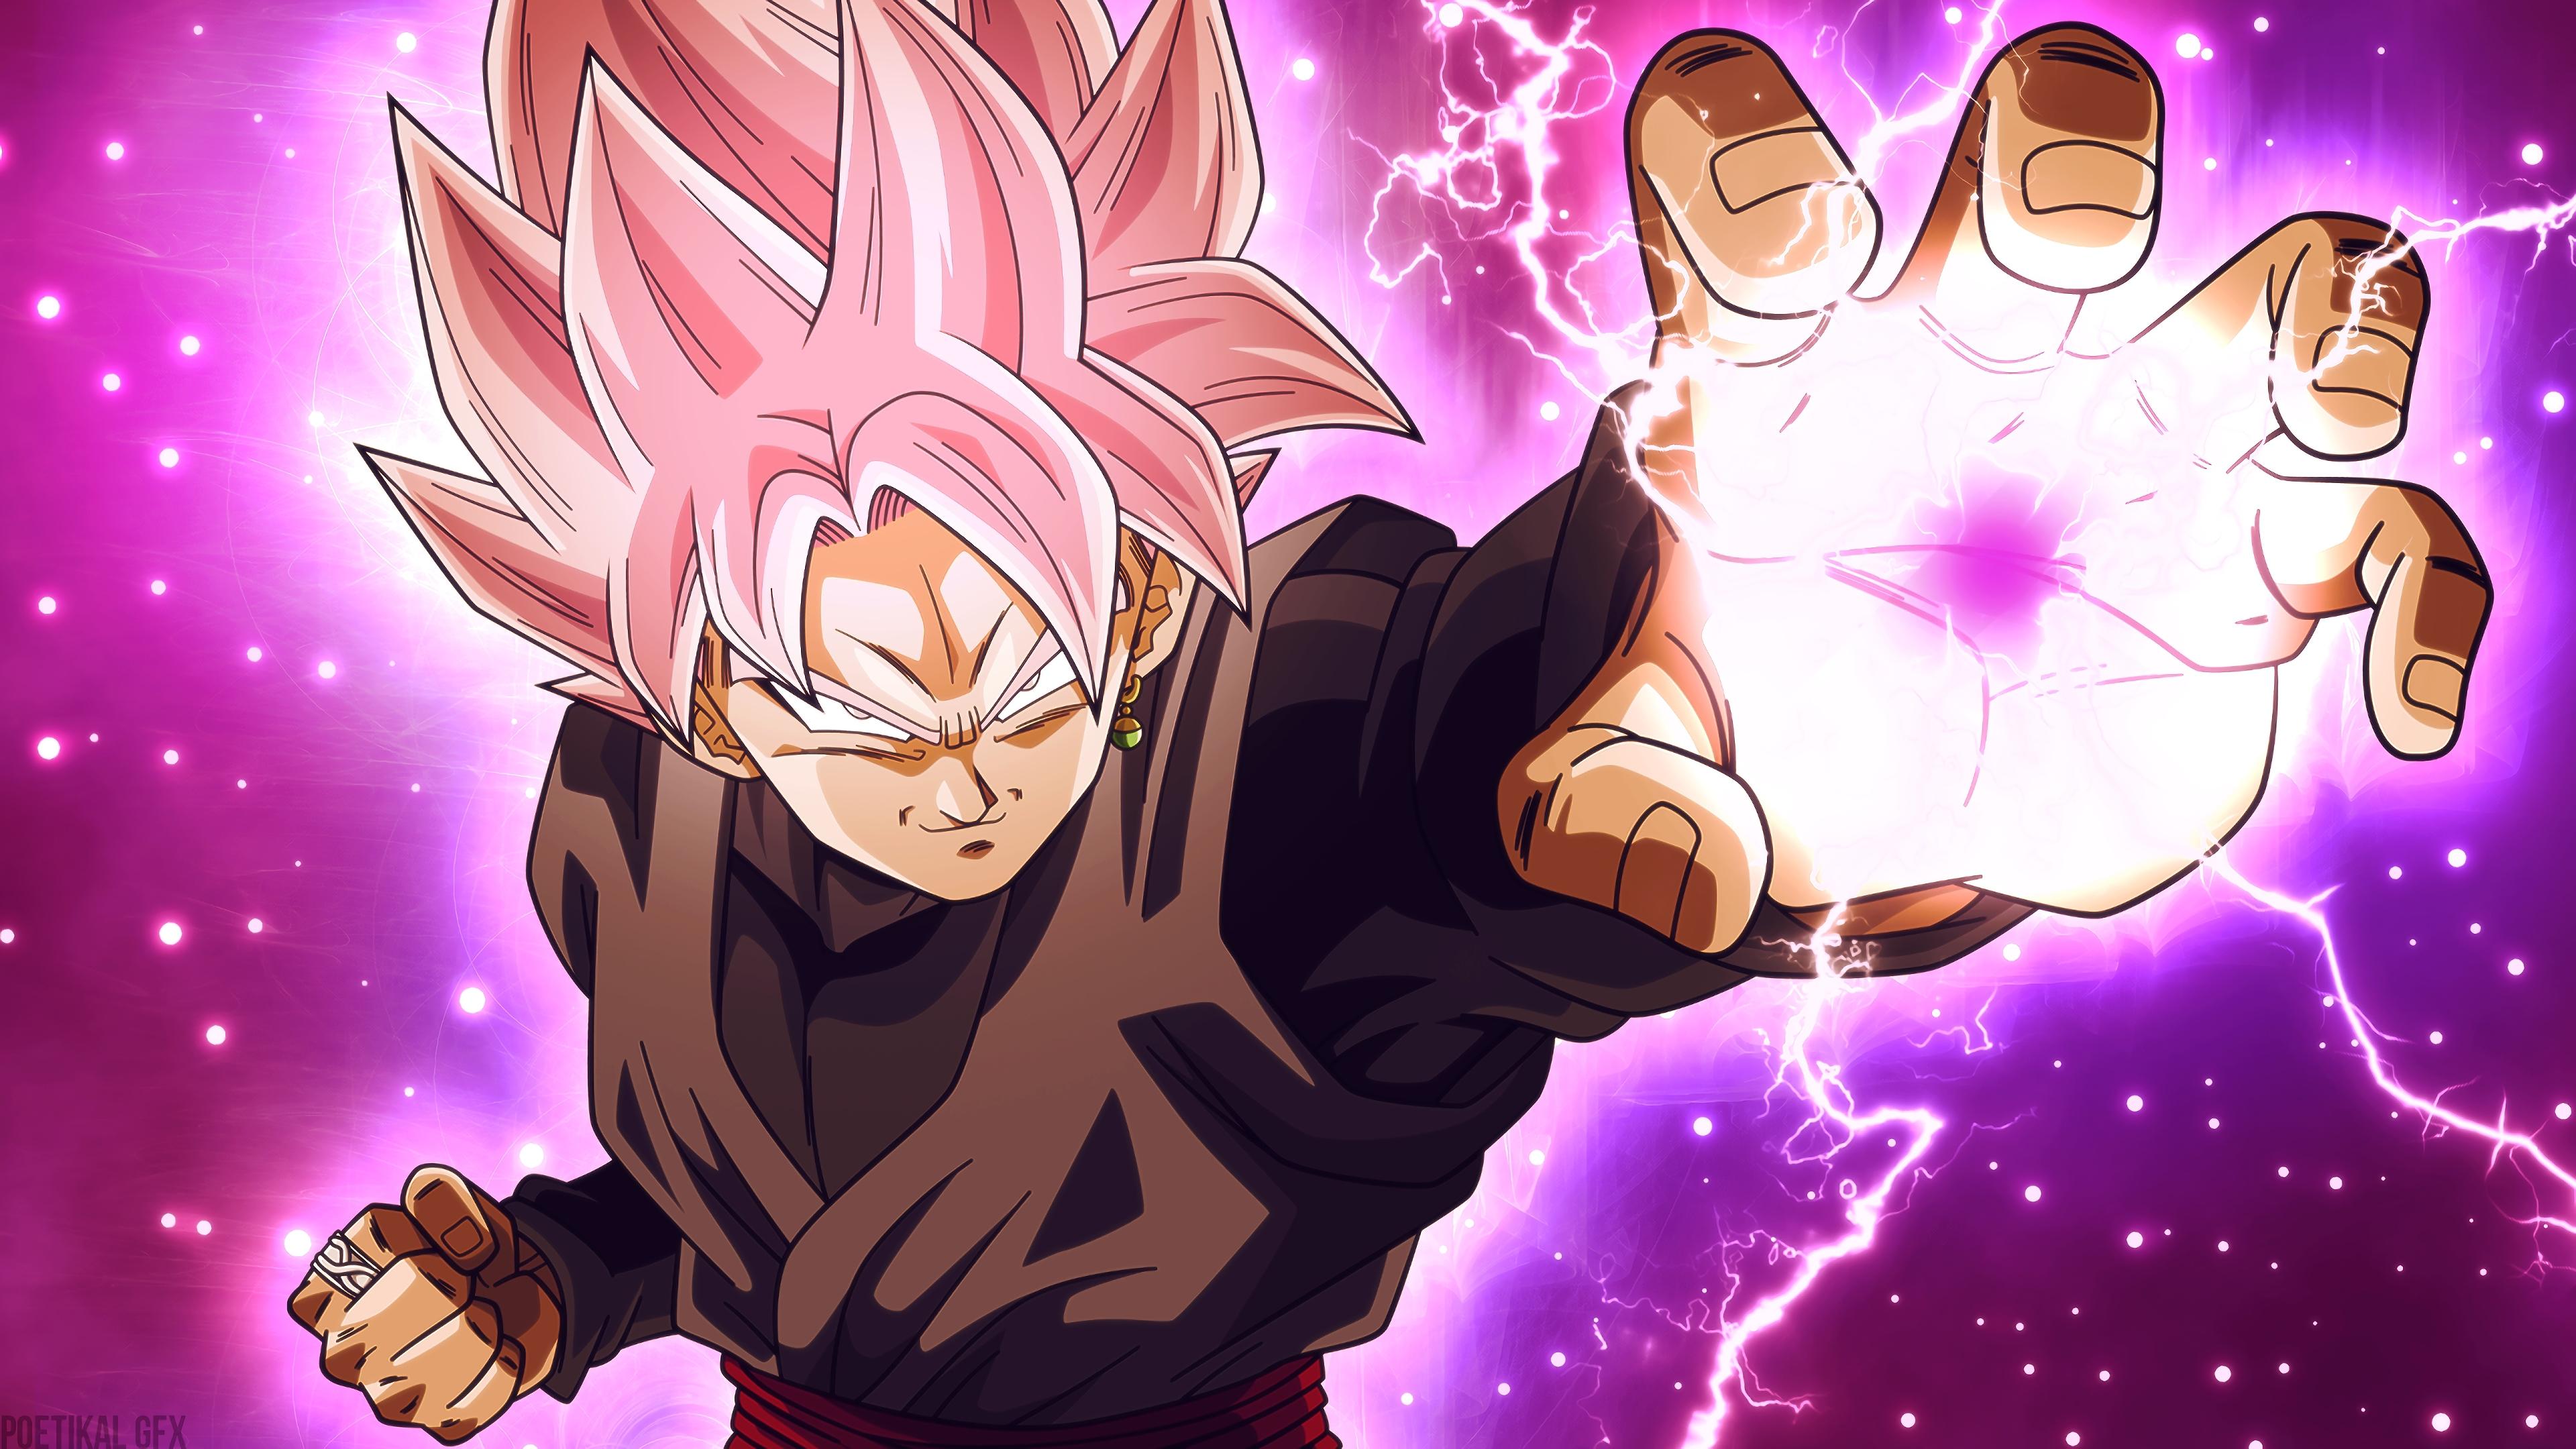 Black Goku - DRAGON BALL SUPER - Zerochan Anime Image Board